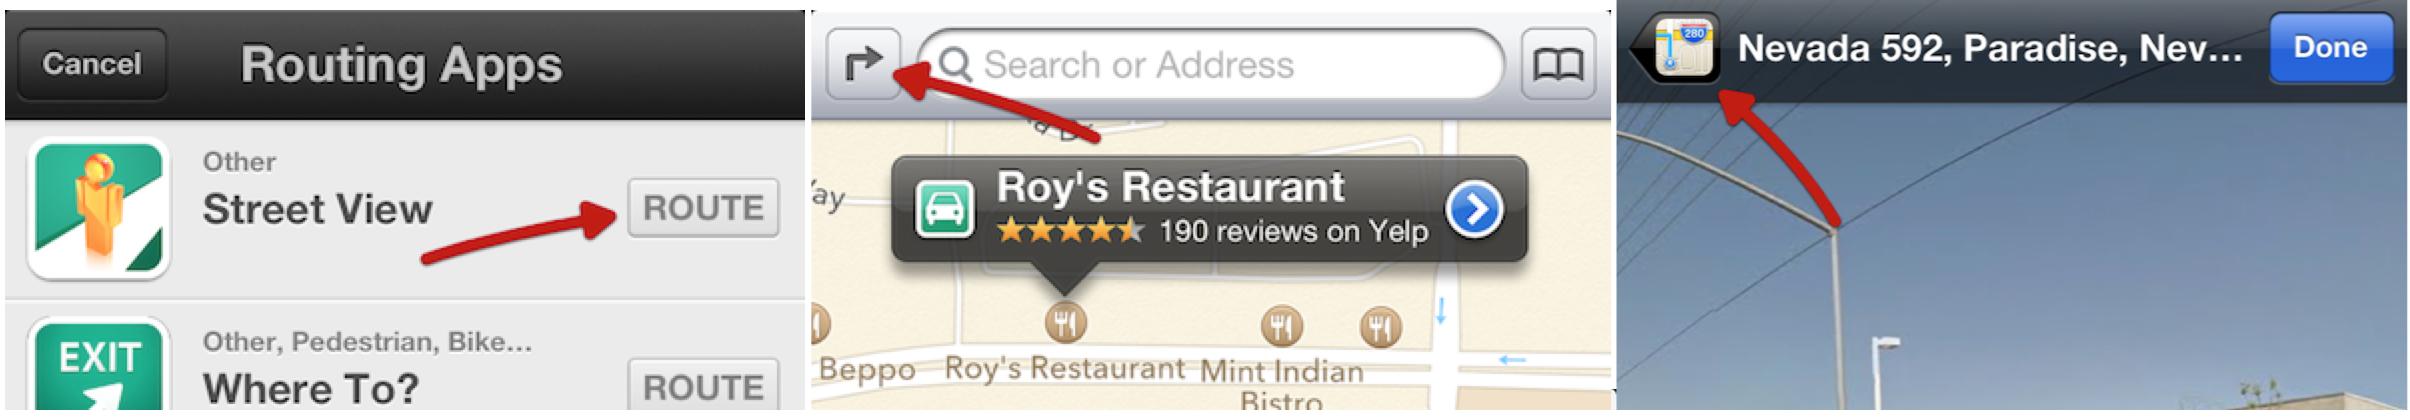 Street-View-iOS-Maps-Route